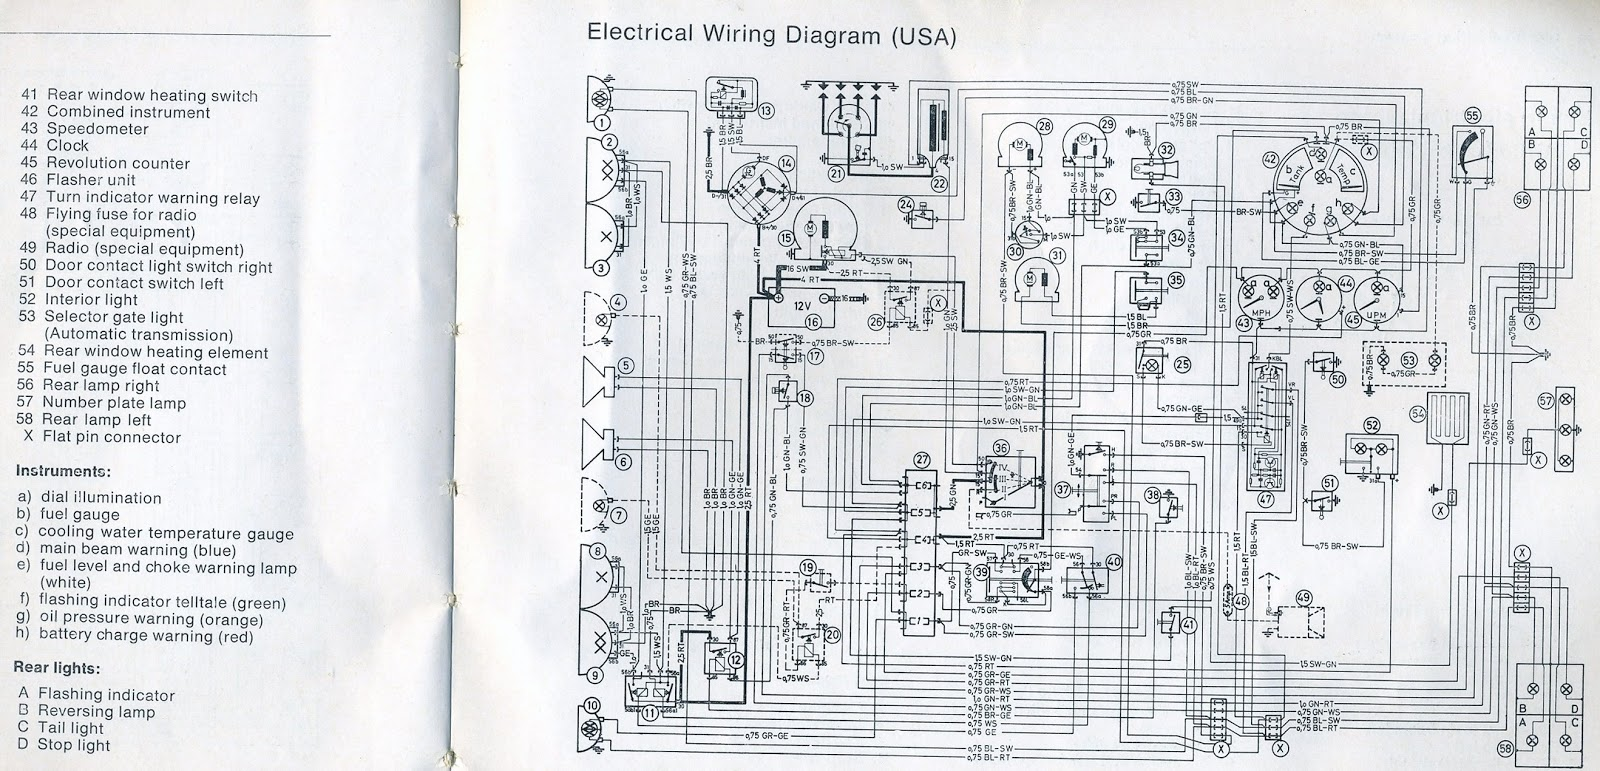 2002 bmw wiring diagrams simple wiring diagram schemabmw 2002 wiring diagram wiring diagram third level daihatsu [ 1600 x 771 Pixel ]